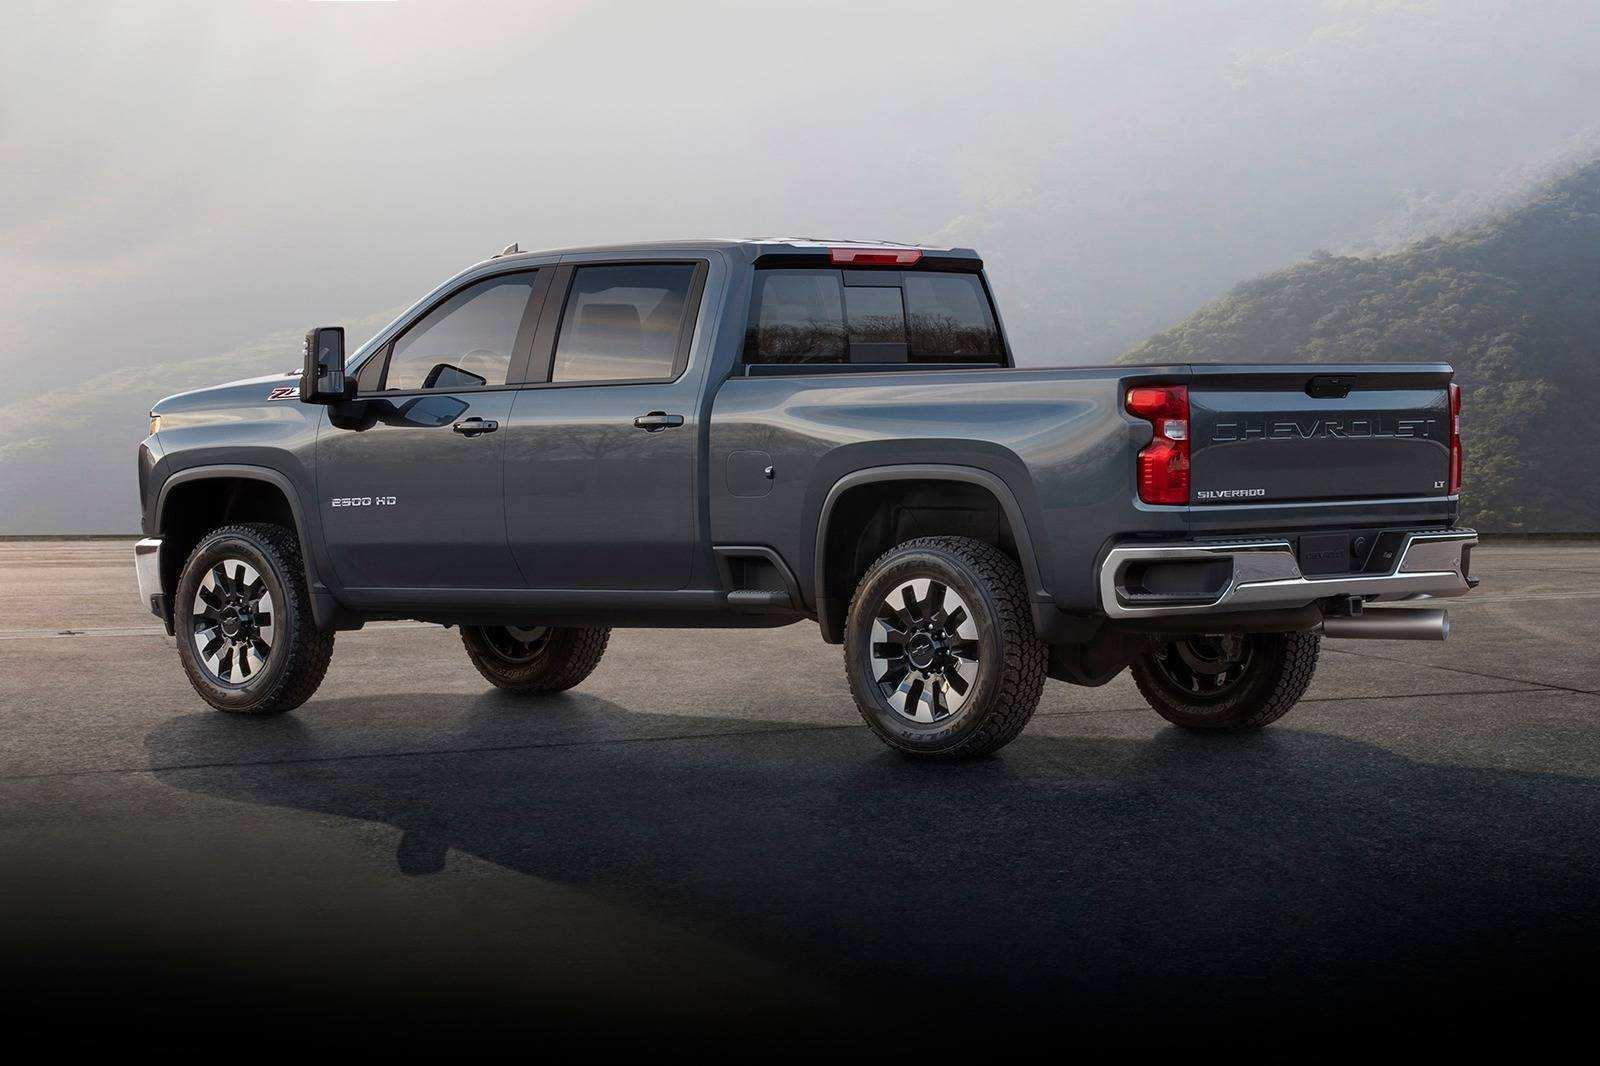 40 Best Review Chevrolet Silverado 2020 Release Date Photos by Chevrolet Silverado 2020 Release Date